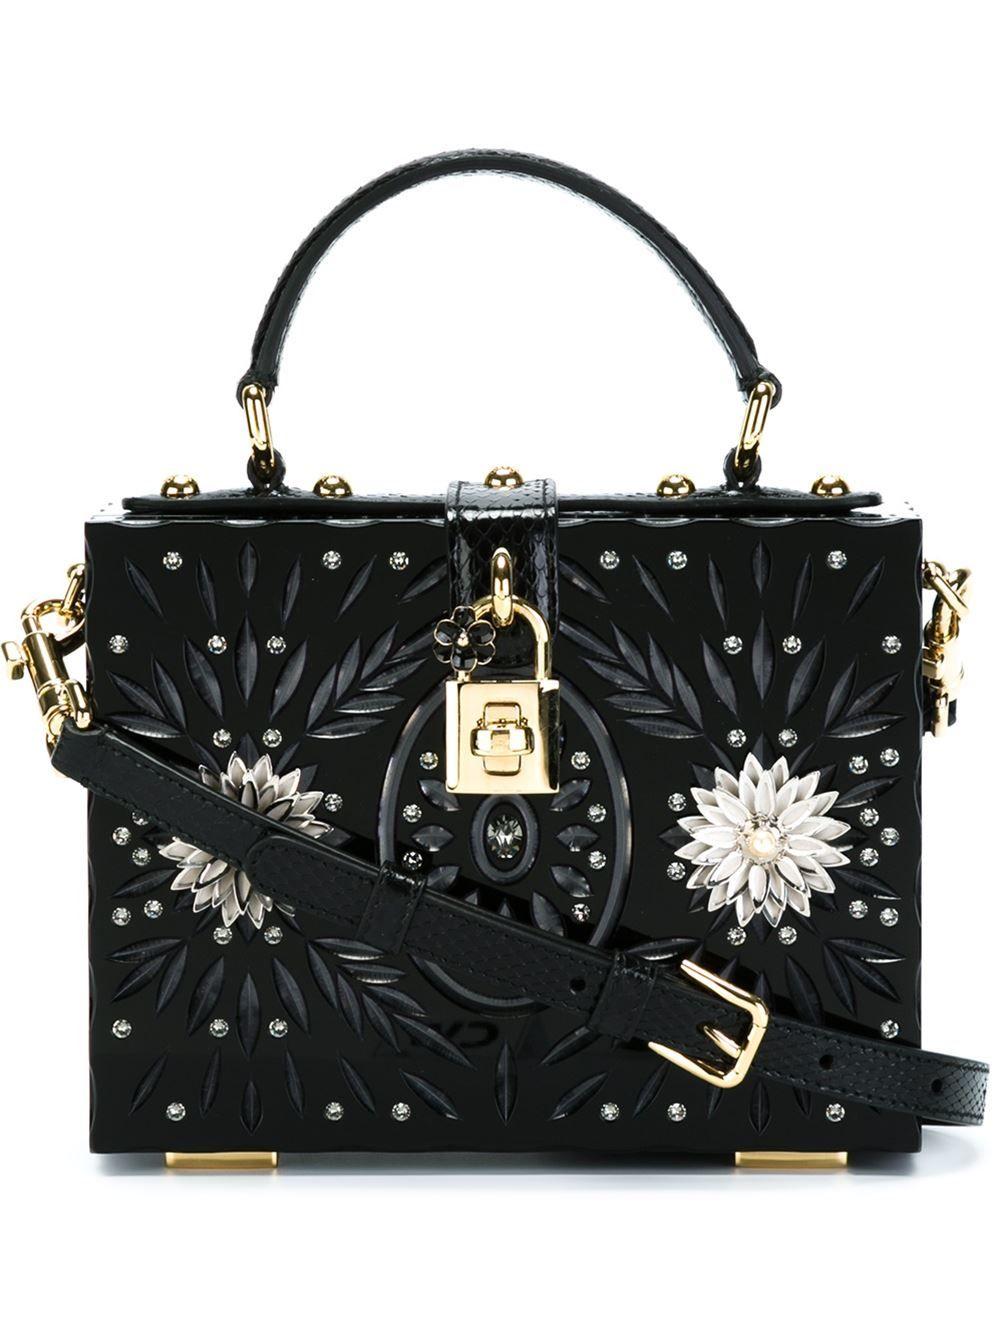 4675cdbb5f35 Dolce & Gabbana Embellished Box Tote Bag - Eraldo - Farfetch.com ...